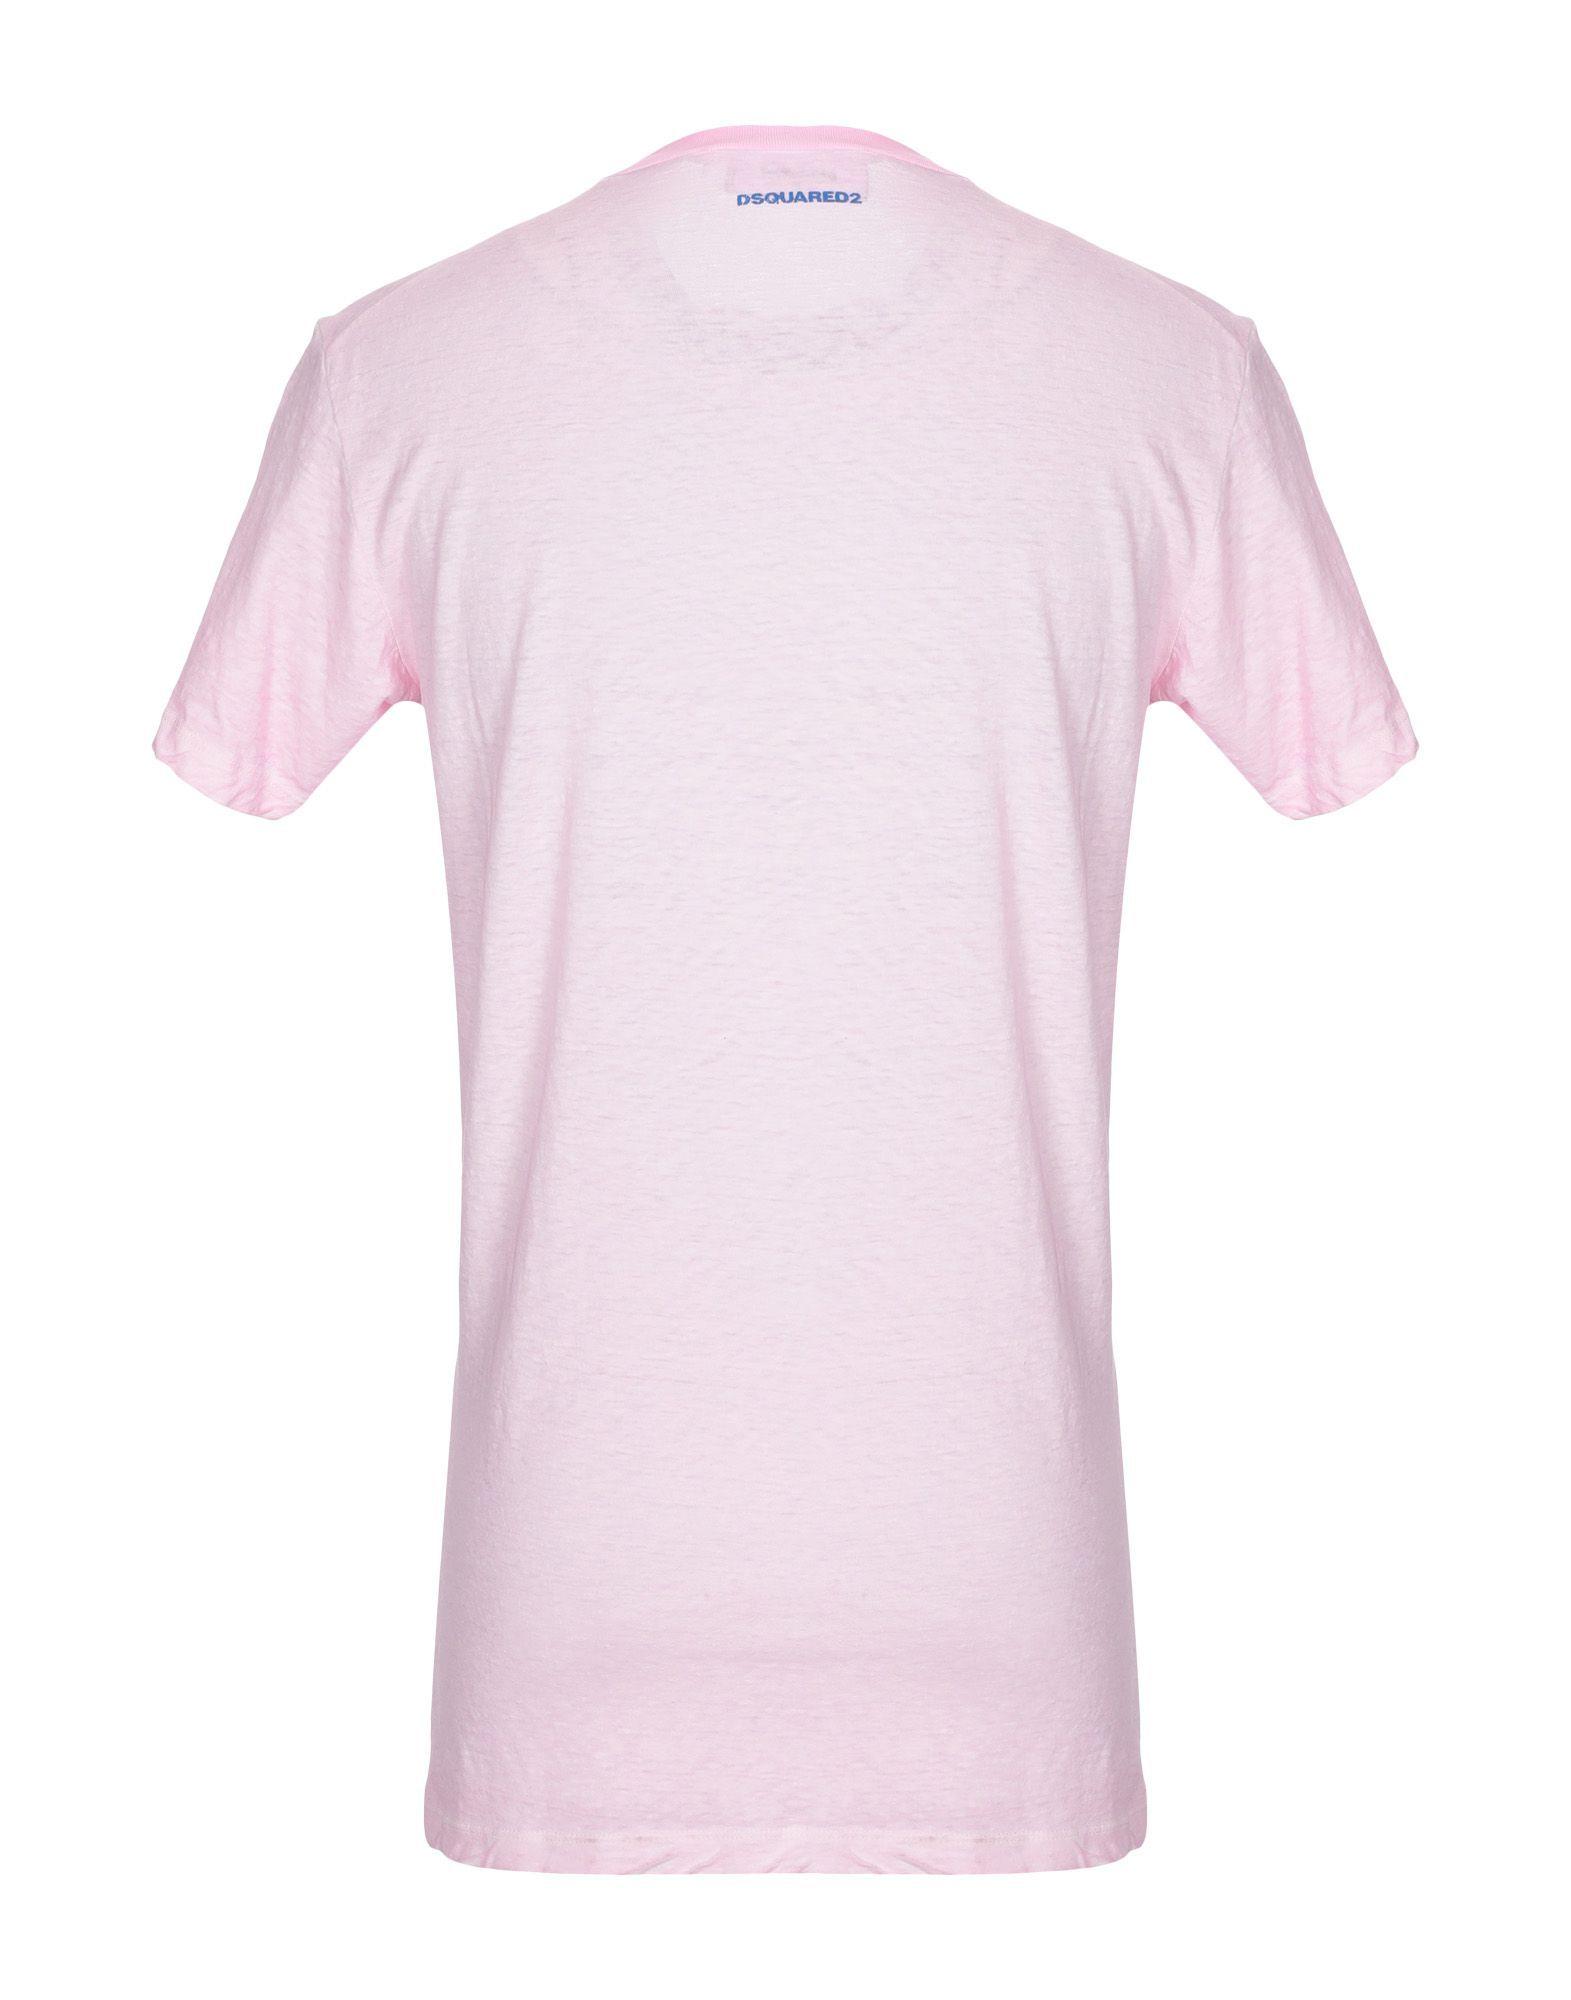 TOPWEAR Dsquared2 Pink Man Cotton